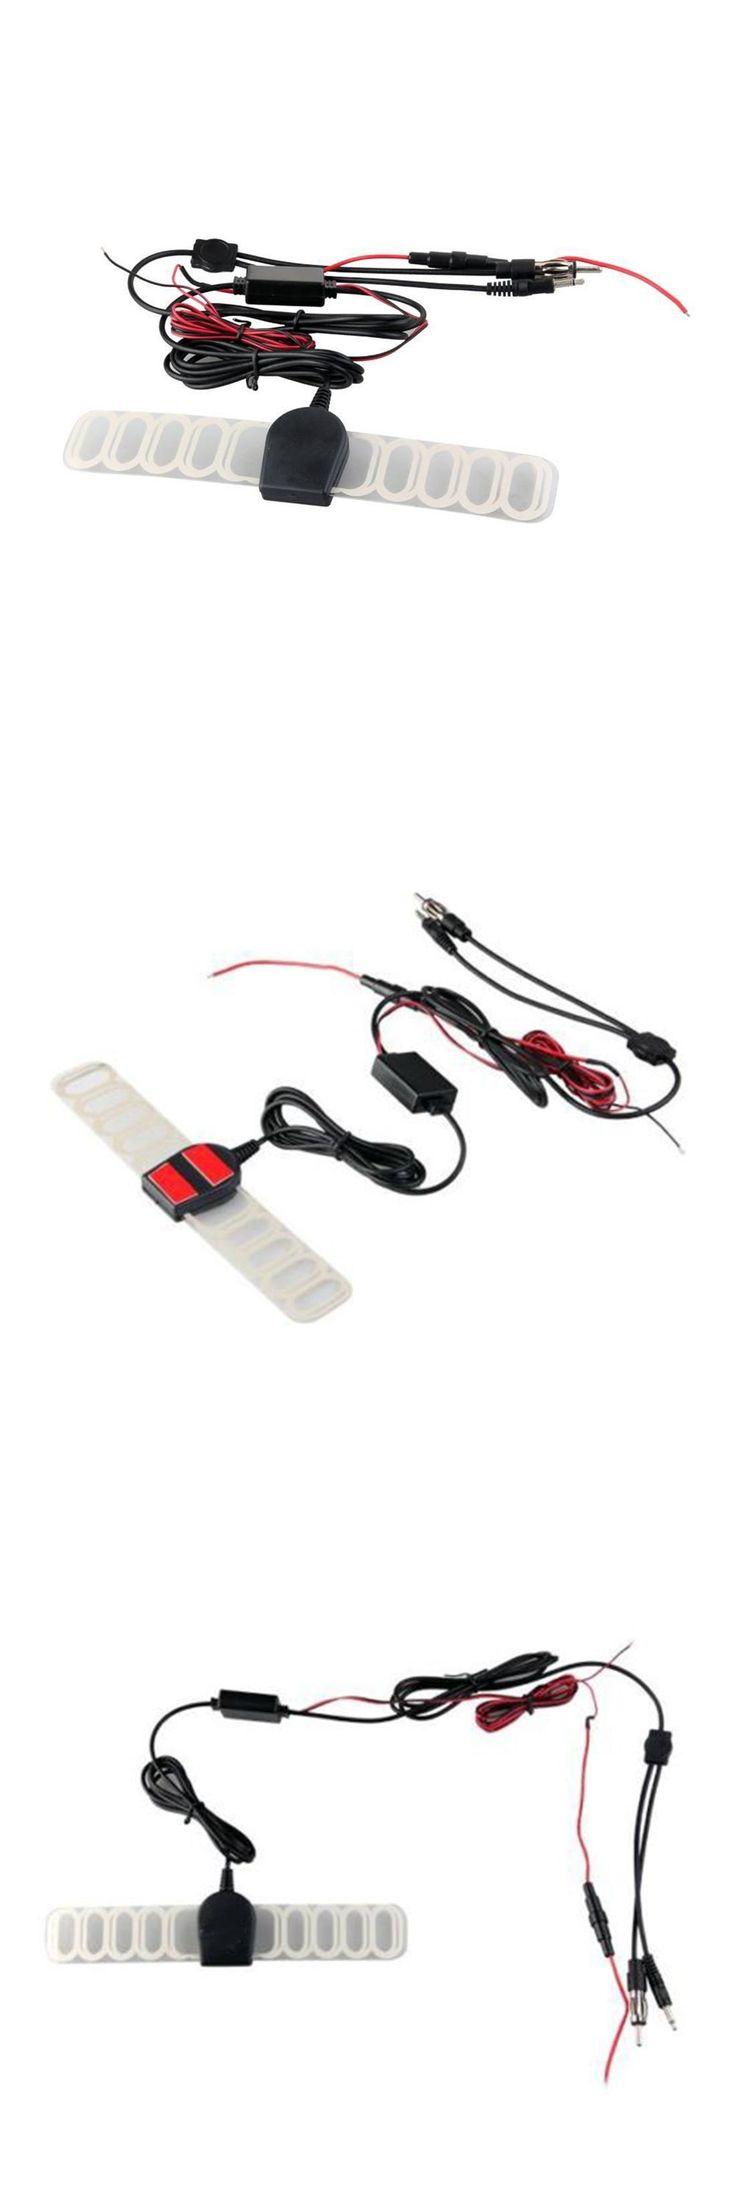 [Visit to Buy] Hot Sale Car Auto TV Digital DVB-T FM Radio Antenna Aerial Amp Amplifier Booster #Advertisement